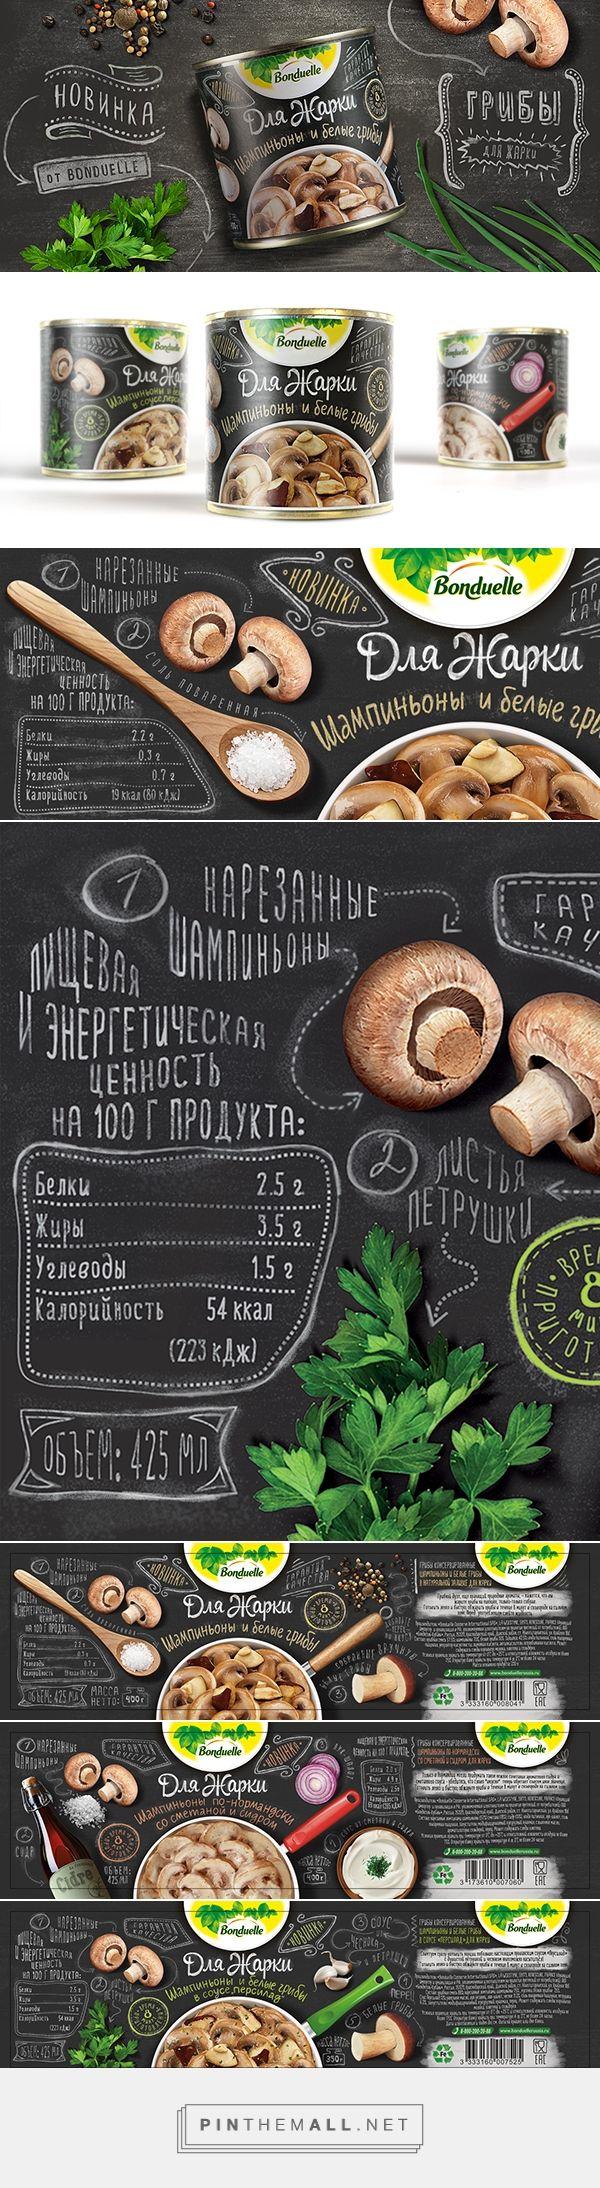 Bonduelle Mushrooms on Behance - created via https://pinthemall.net